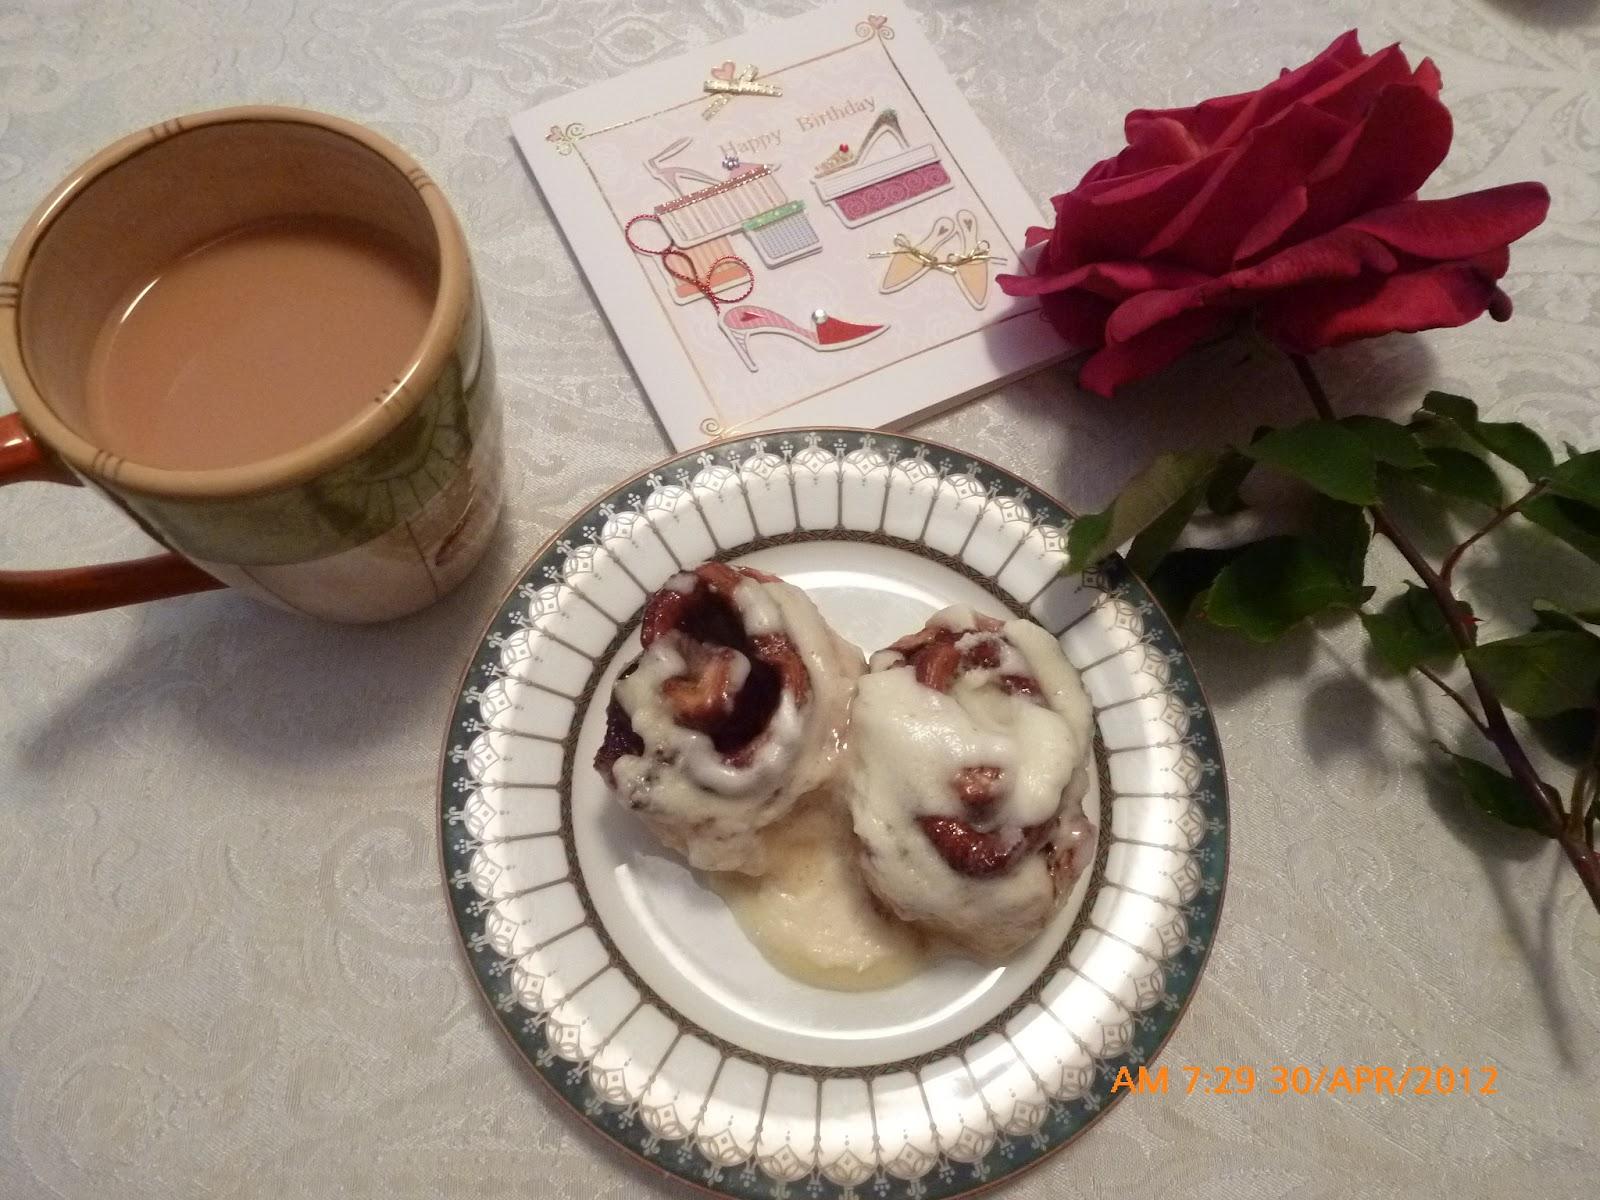 Birthday Feasts From Olive Garden Birthday Serenade High Tea